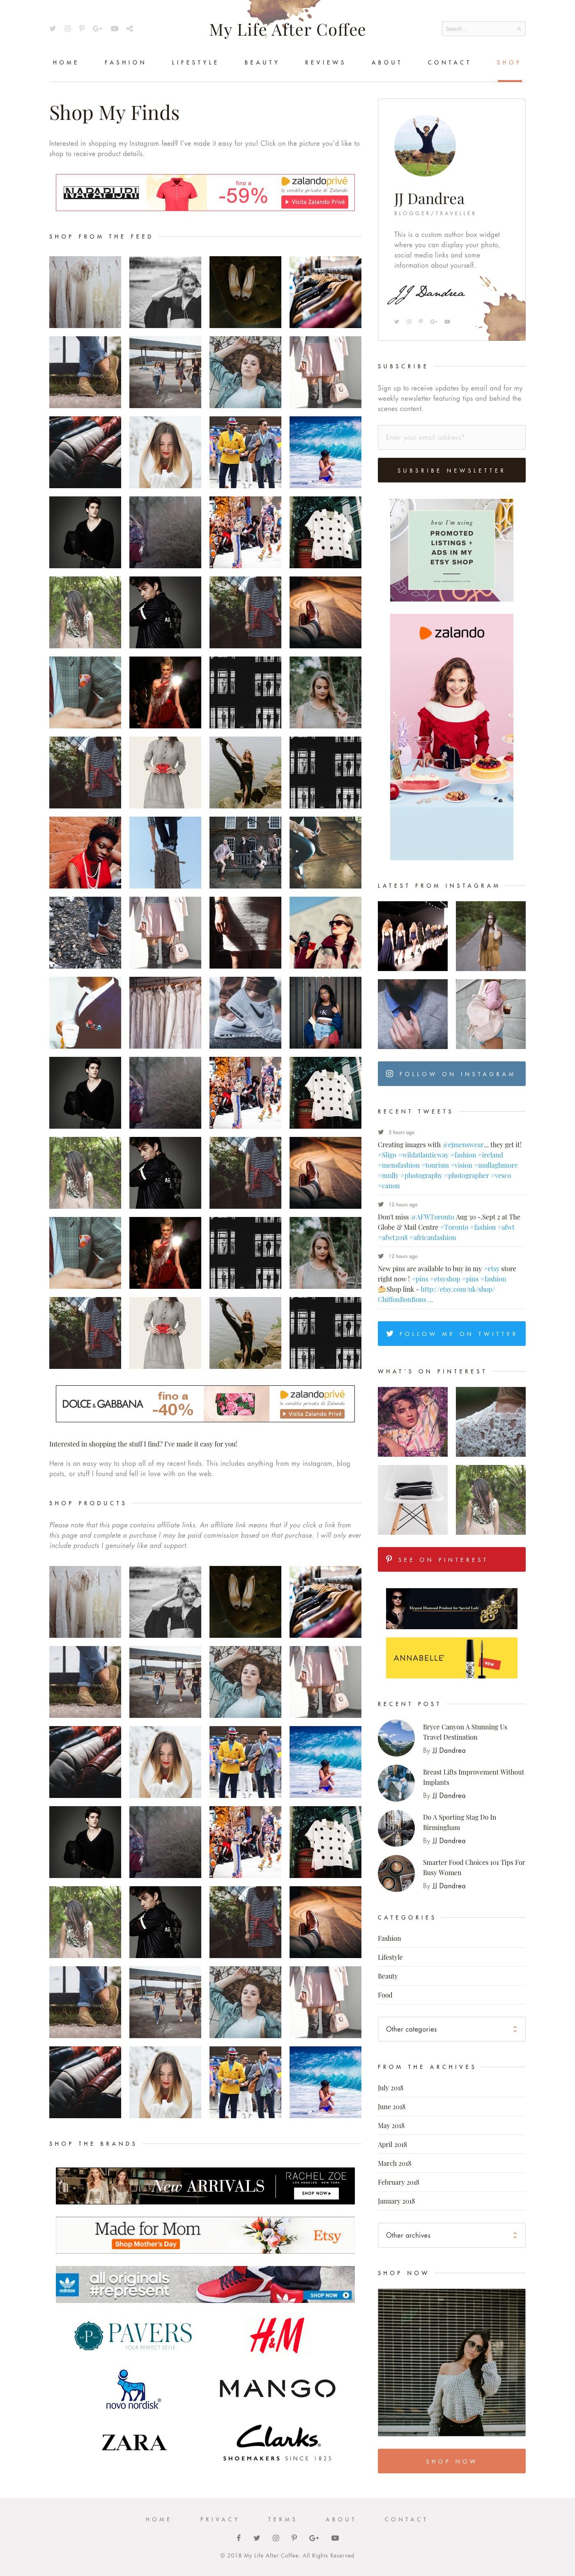 My Life After Coffee WordPress Fashion Blog Design